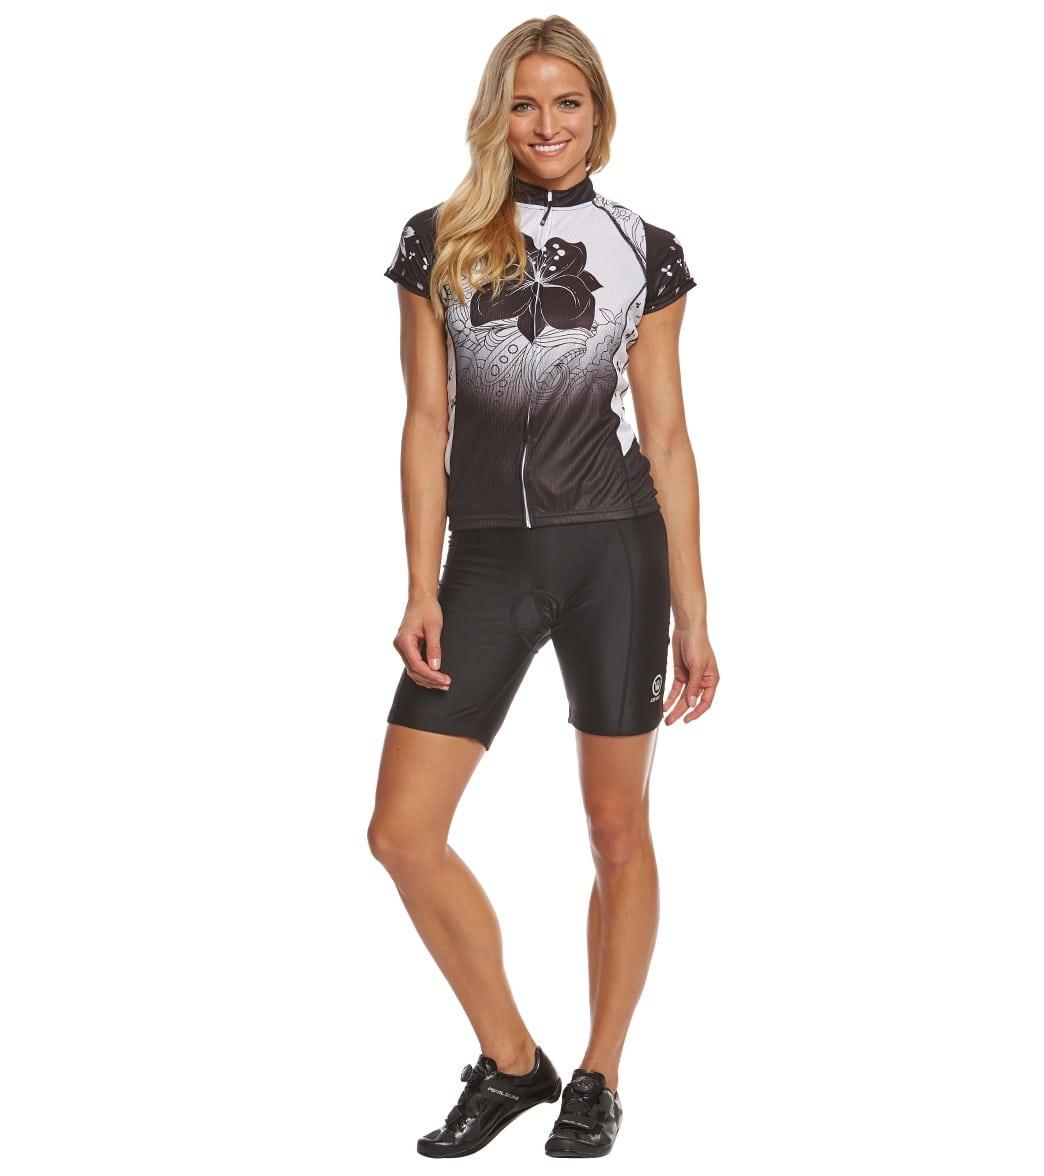 3136e21b4d1b5 Canari Women s Velocity Cycling Short at SwimOutlet.com